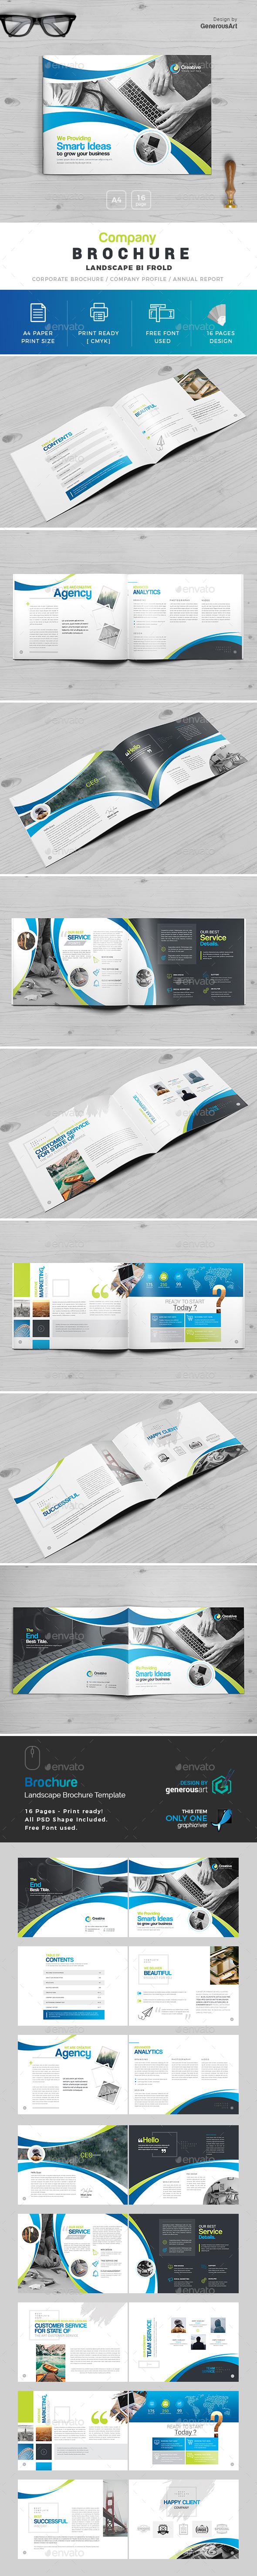 Landscape Brochure - Brochures Print Templates